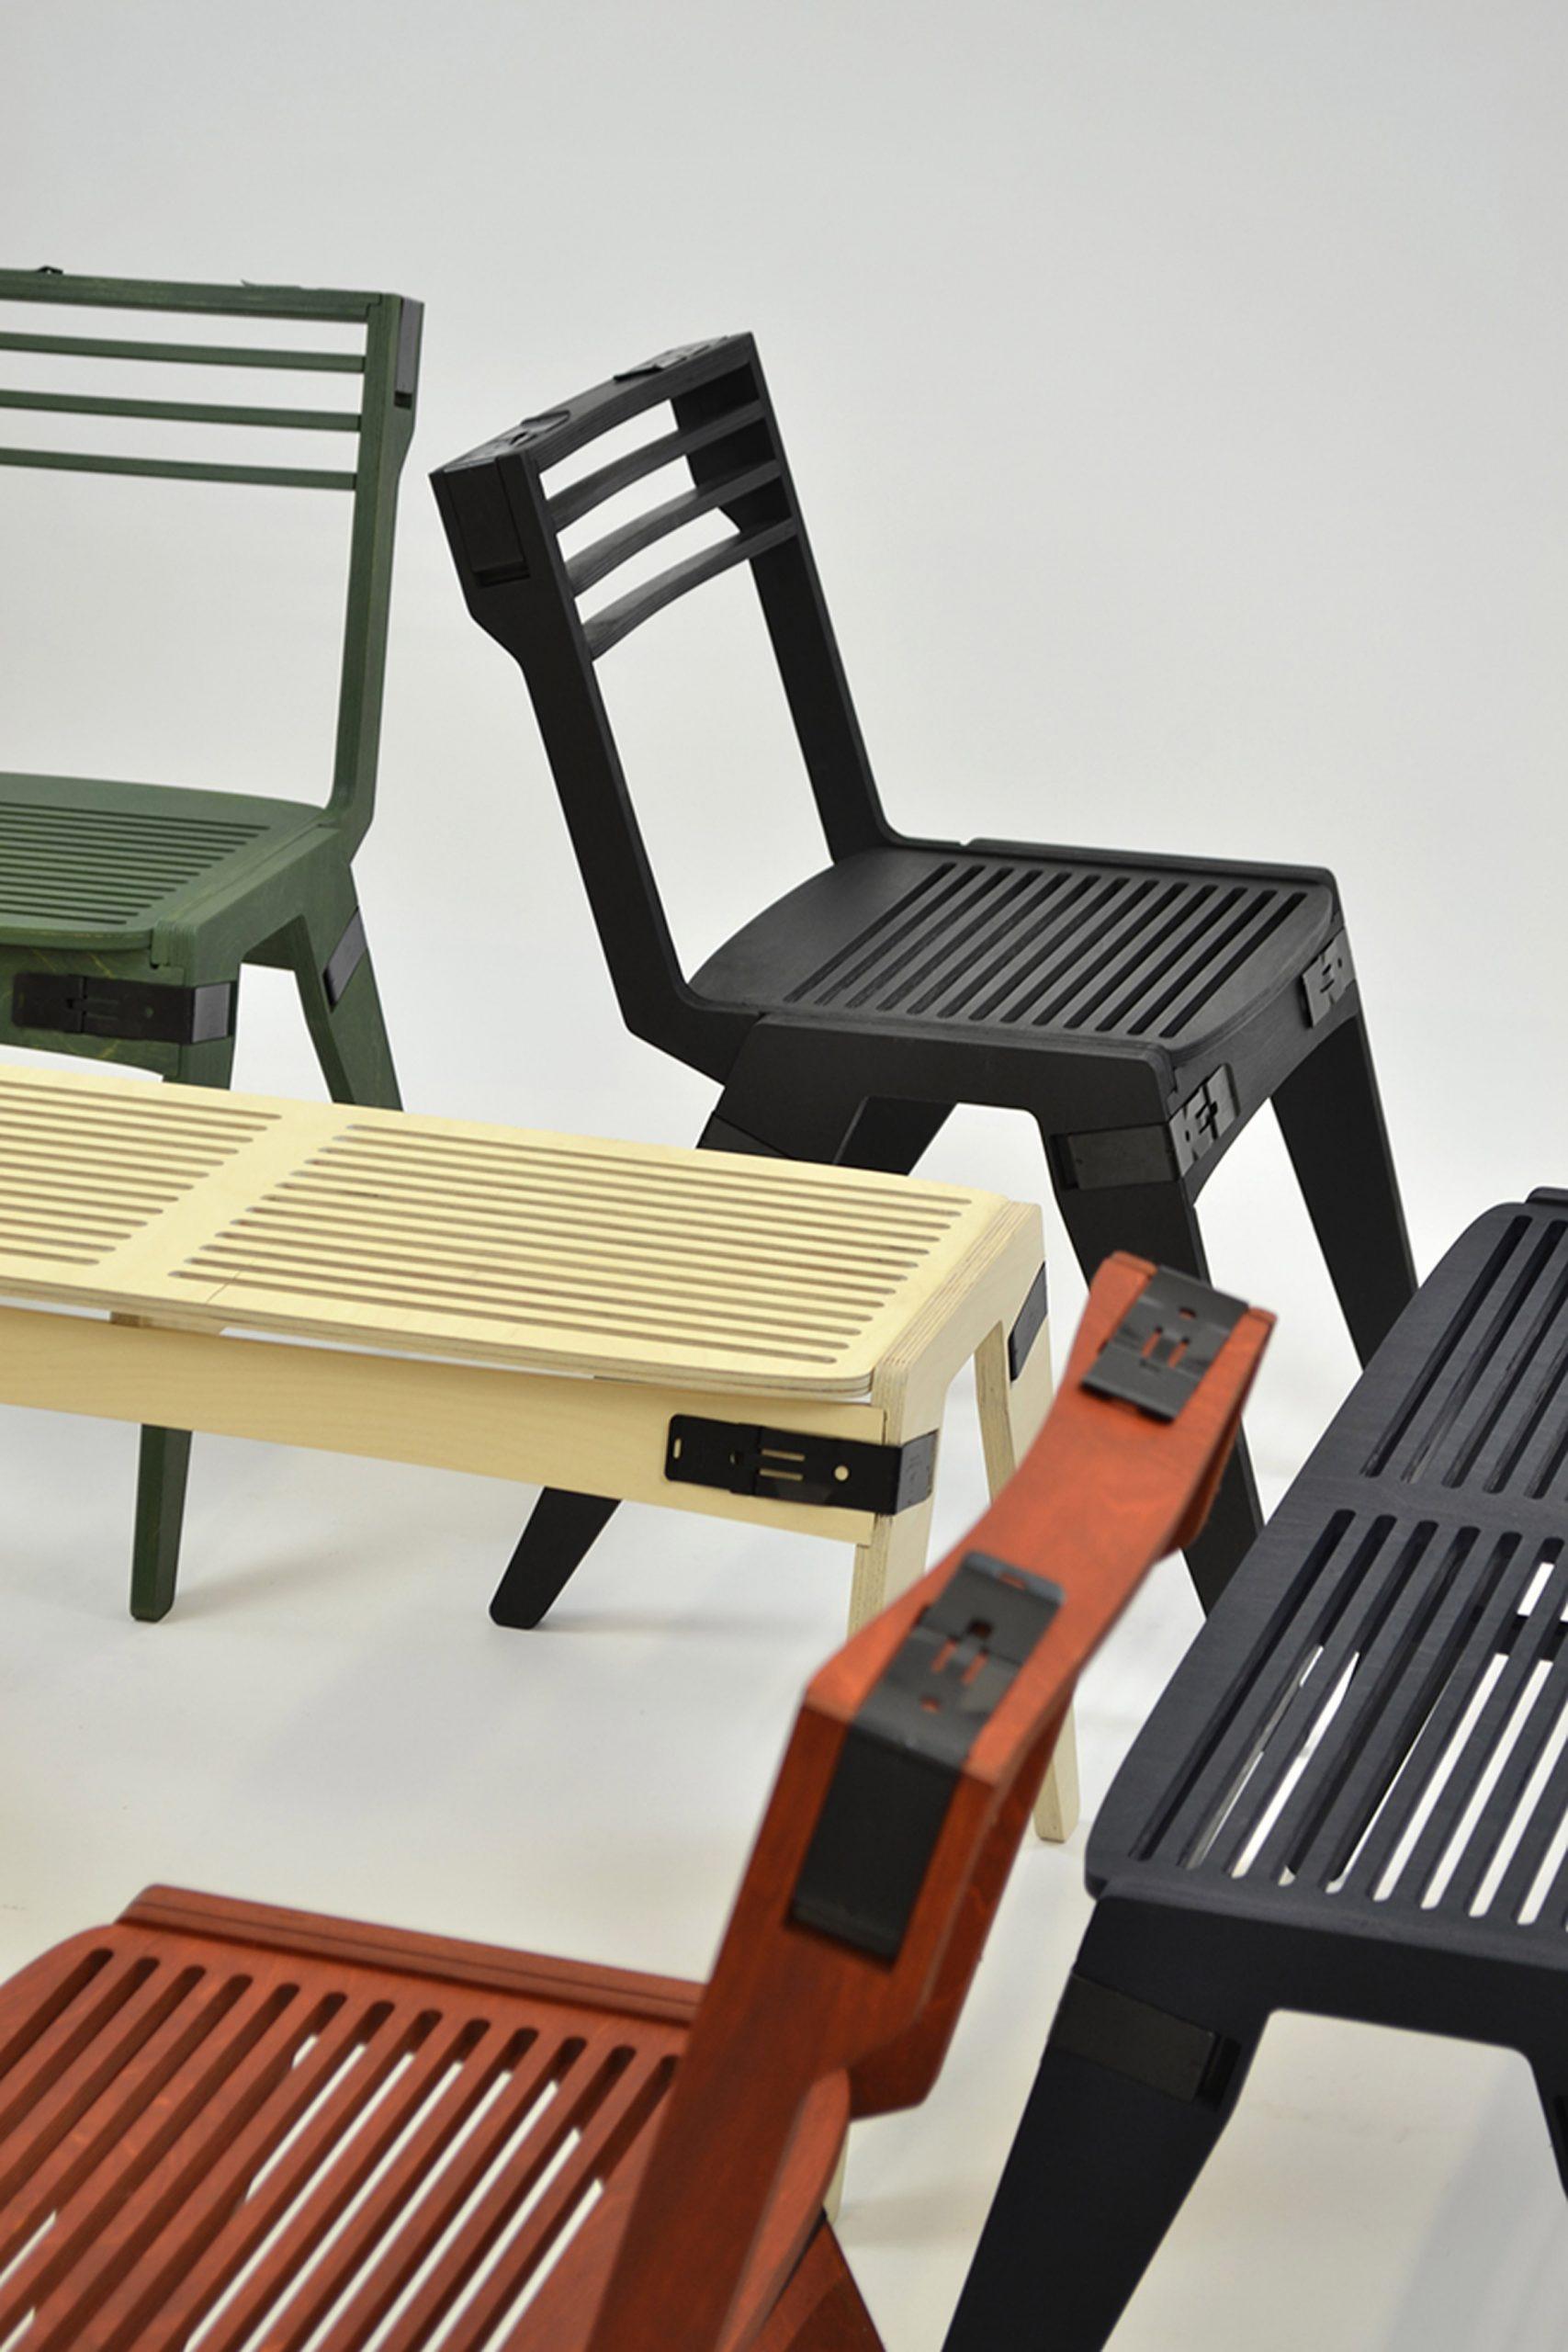 Originals flat-pack furniture range